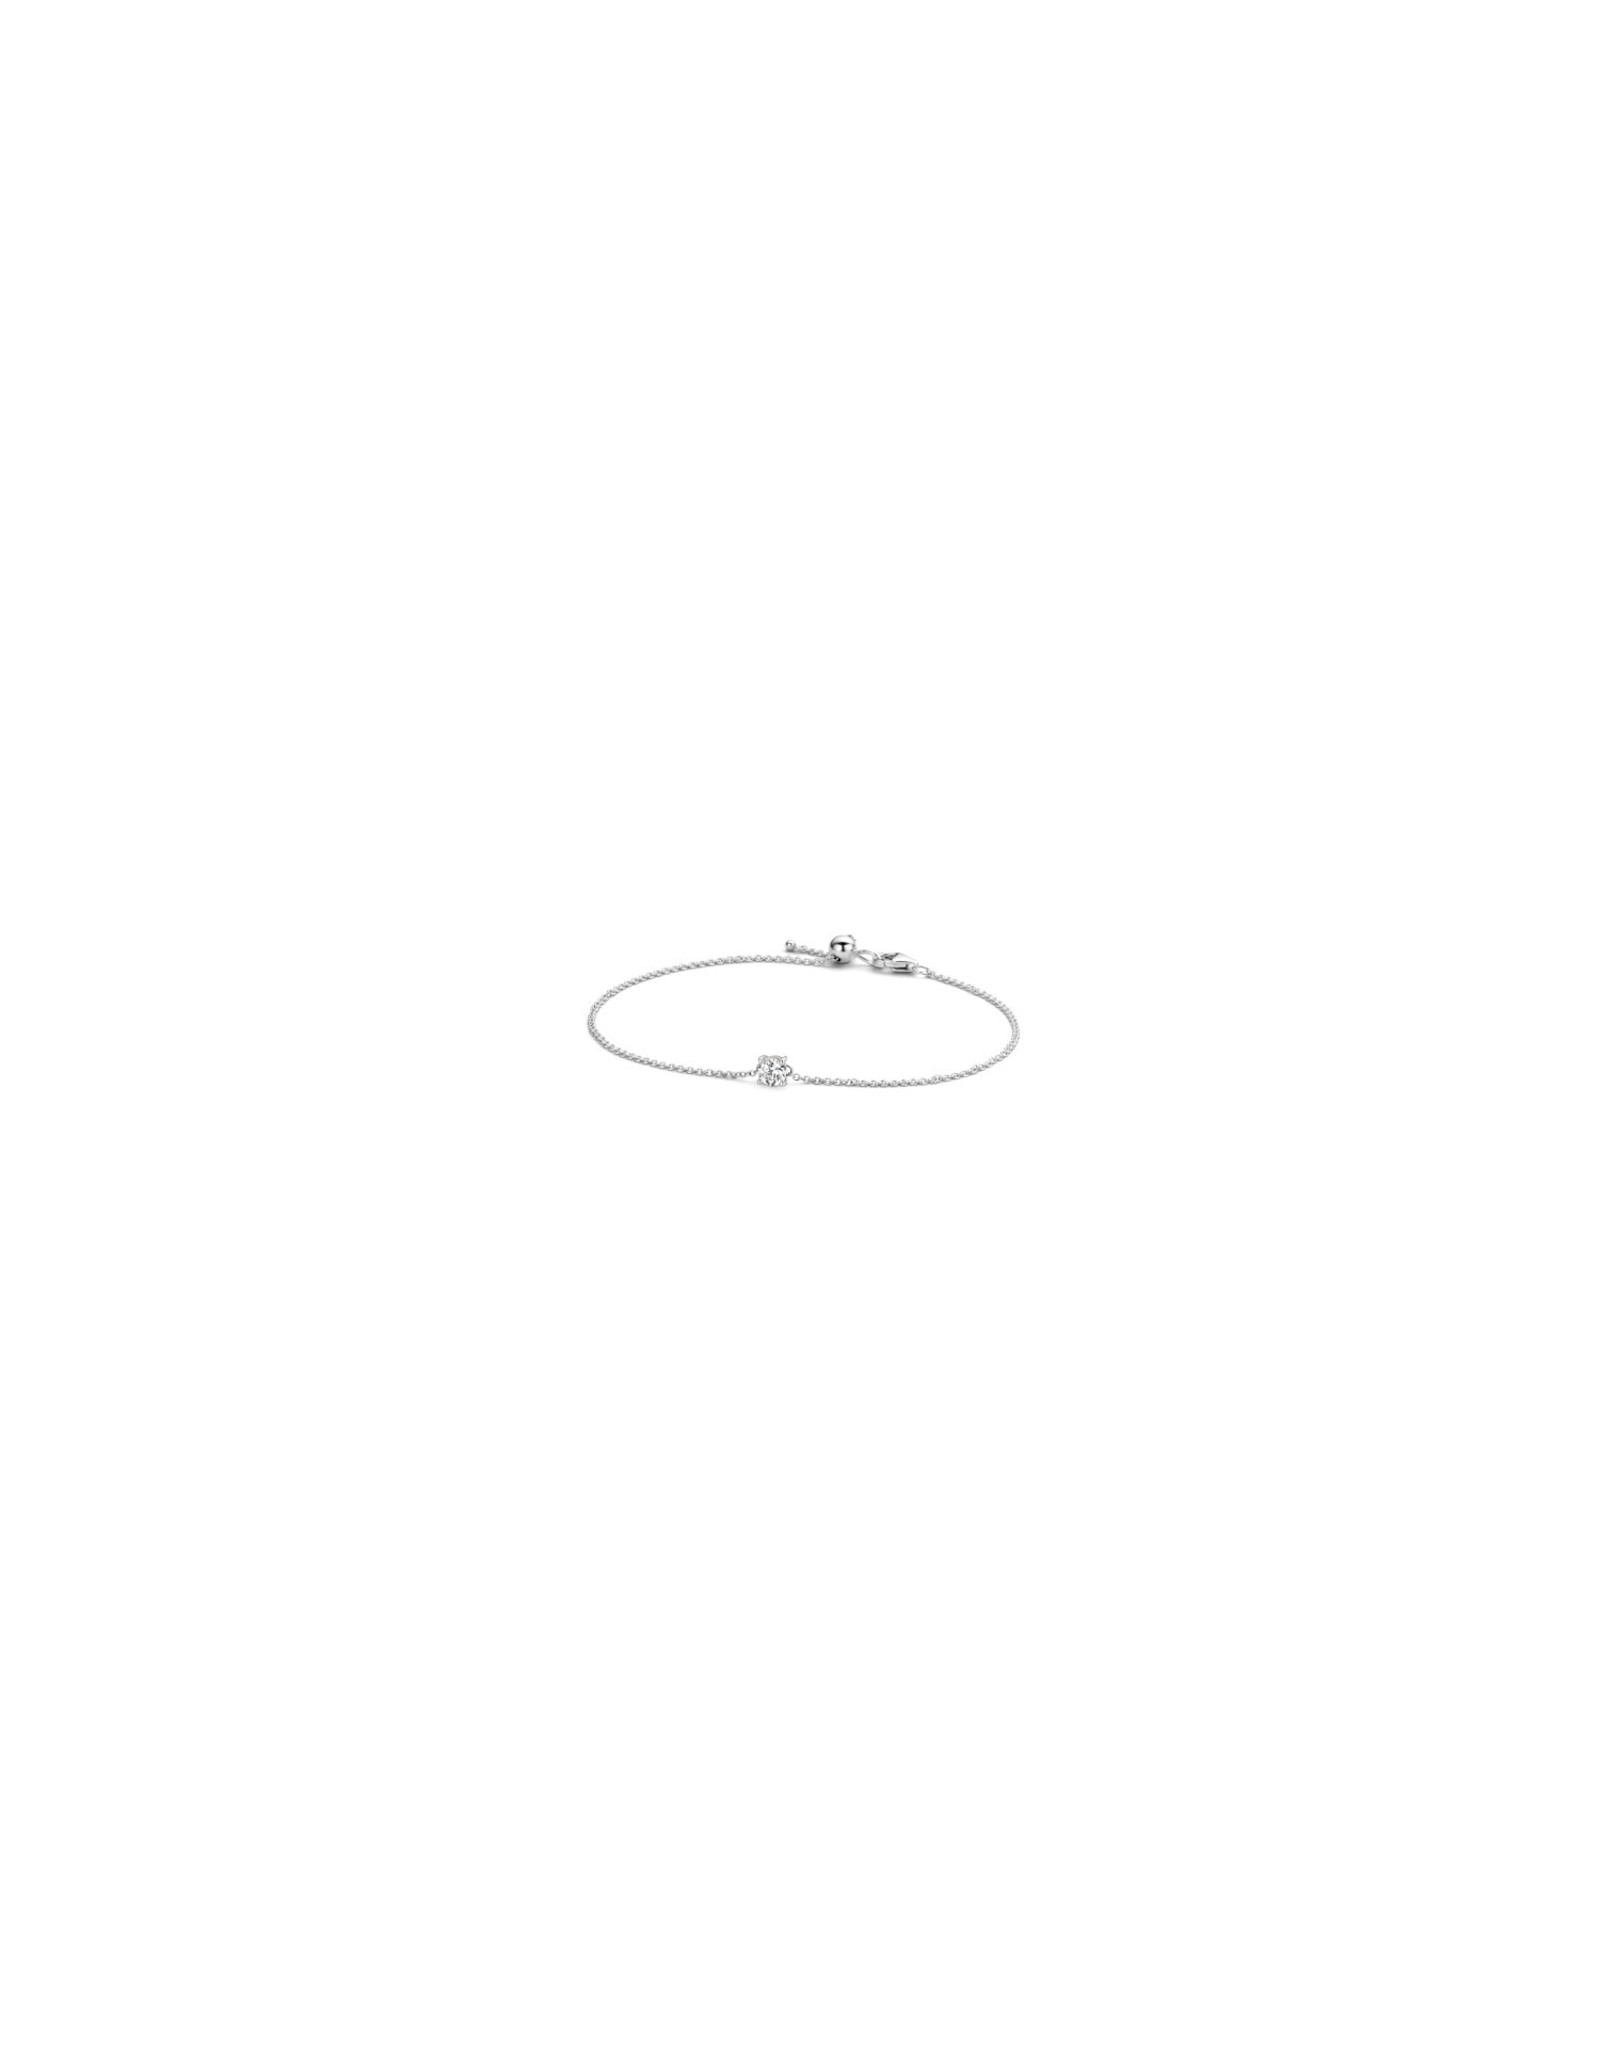 Blush Armband wit goud 14kt 2166WZI zirkoon